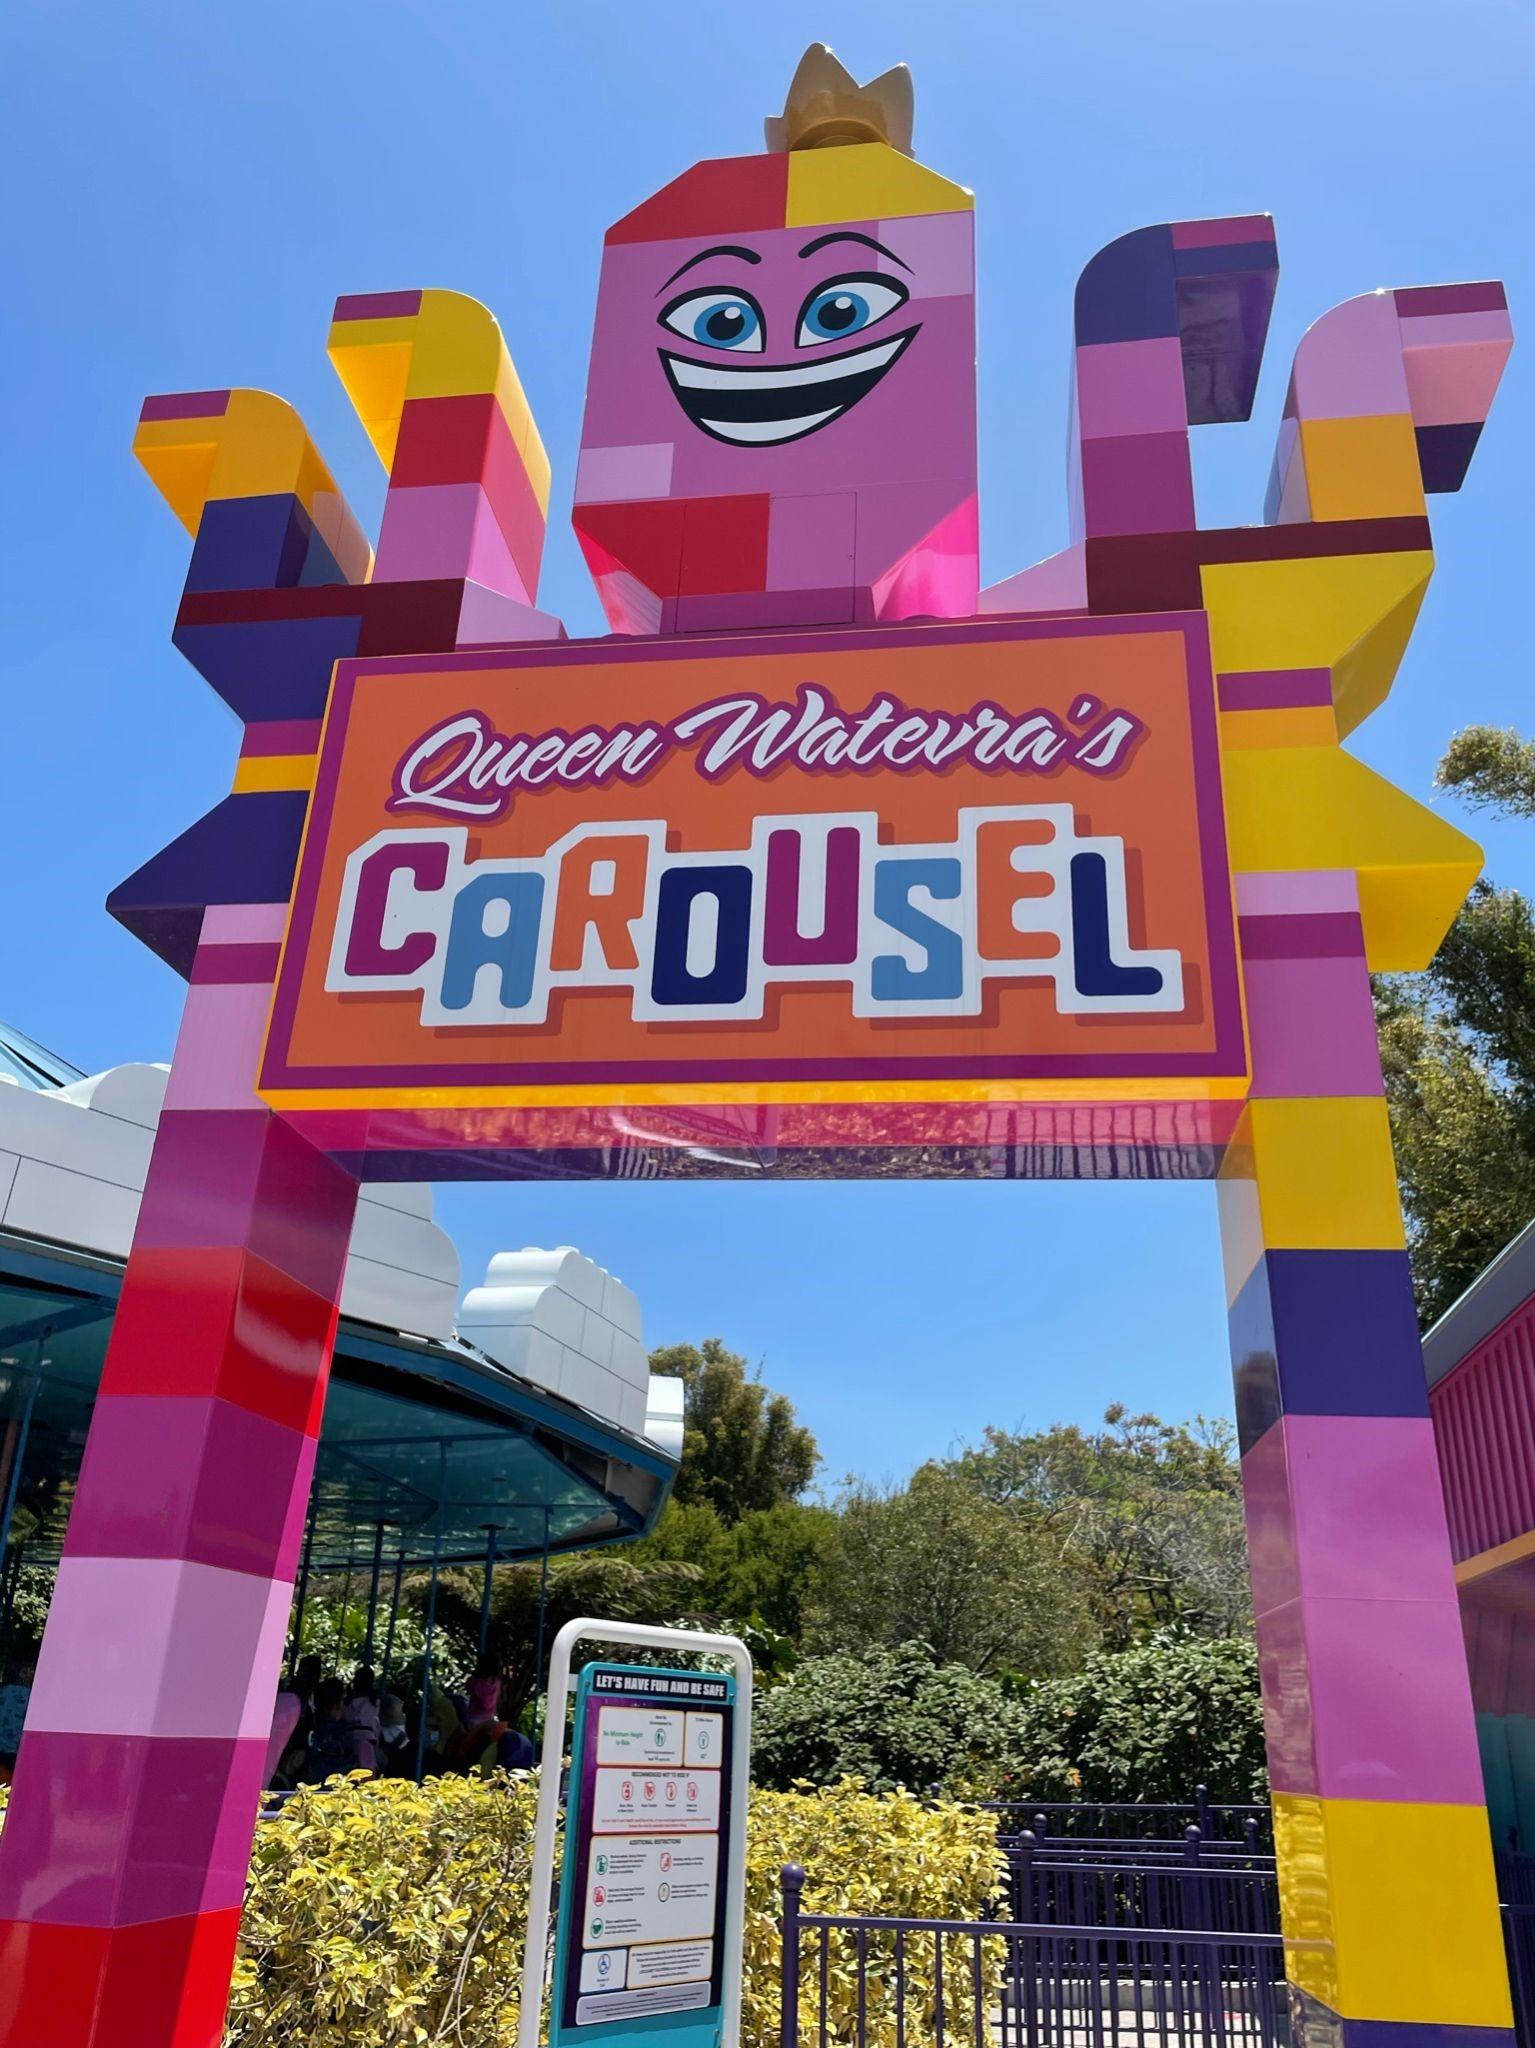 Legoland carousel sign